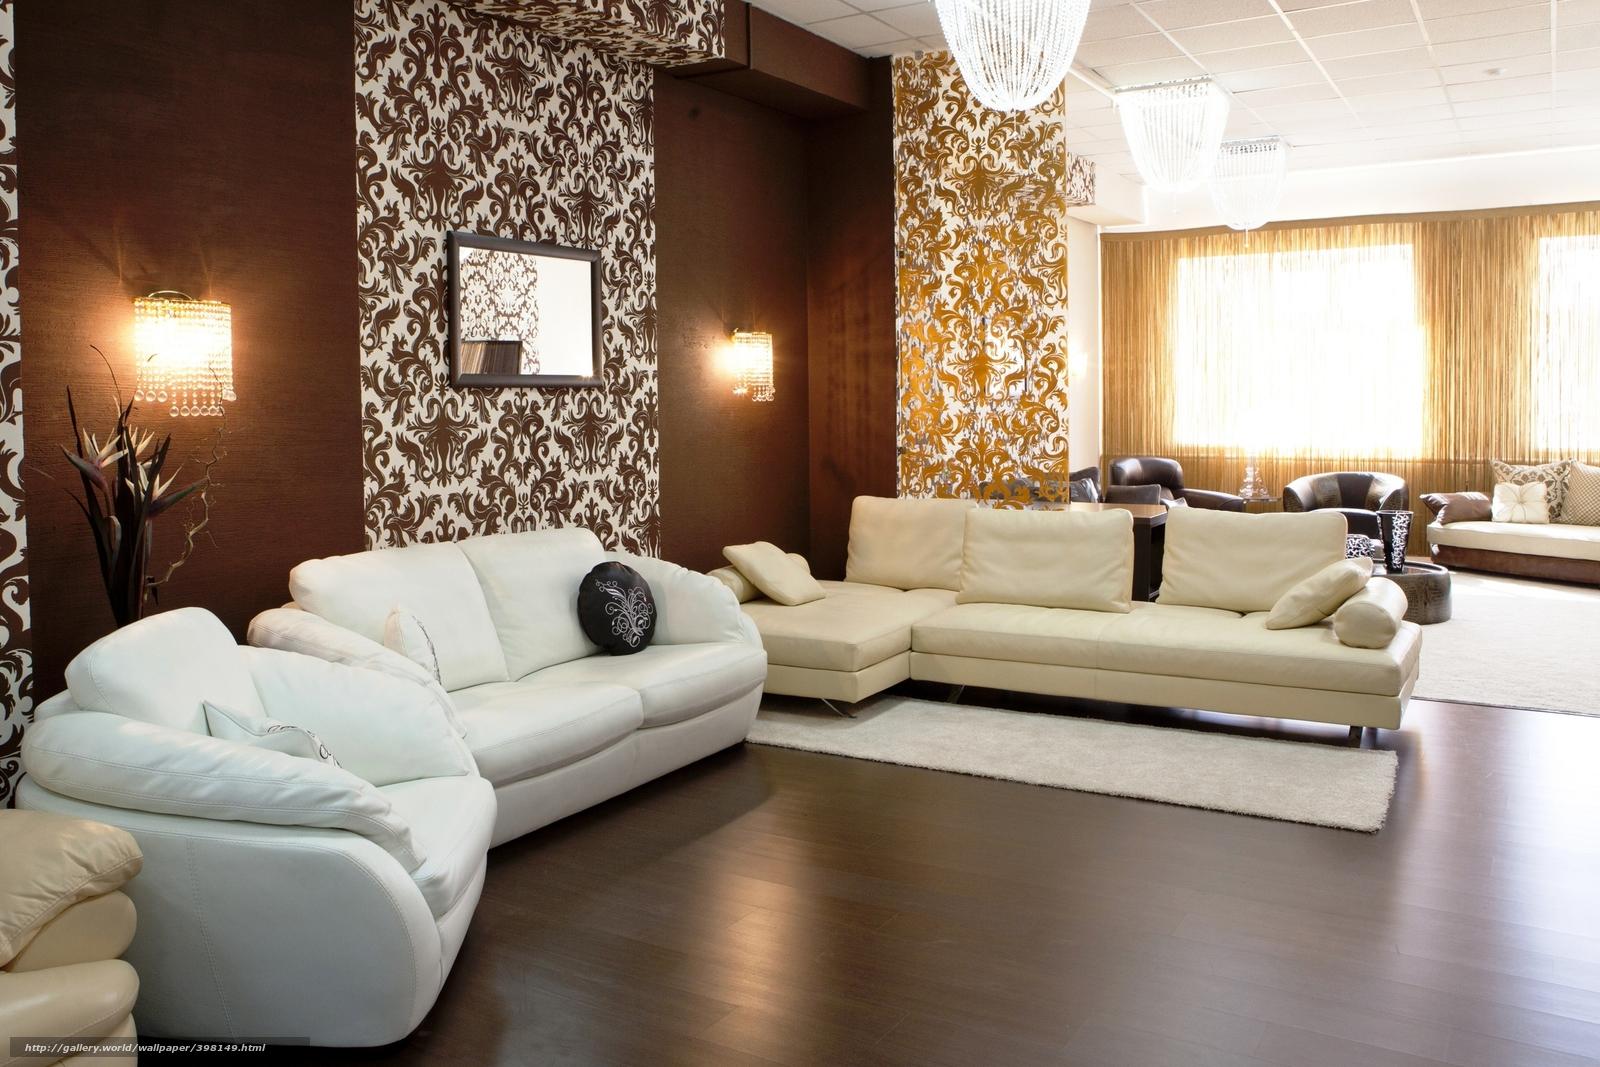 Sala De Estar Parede Marrom ~ projeto, bege, estilo, marrom, interior, sala de estar, sof, Branco